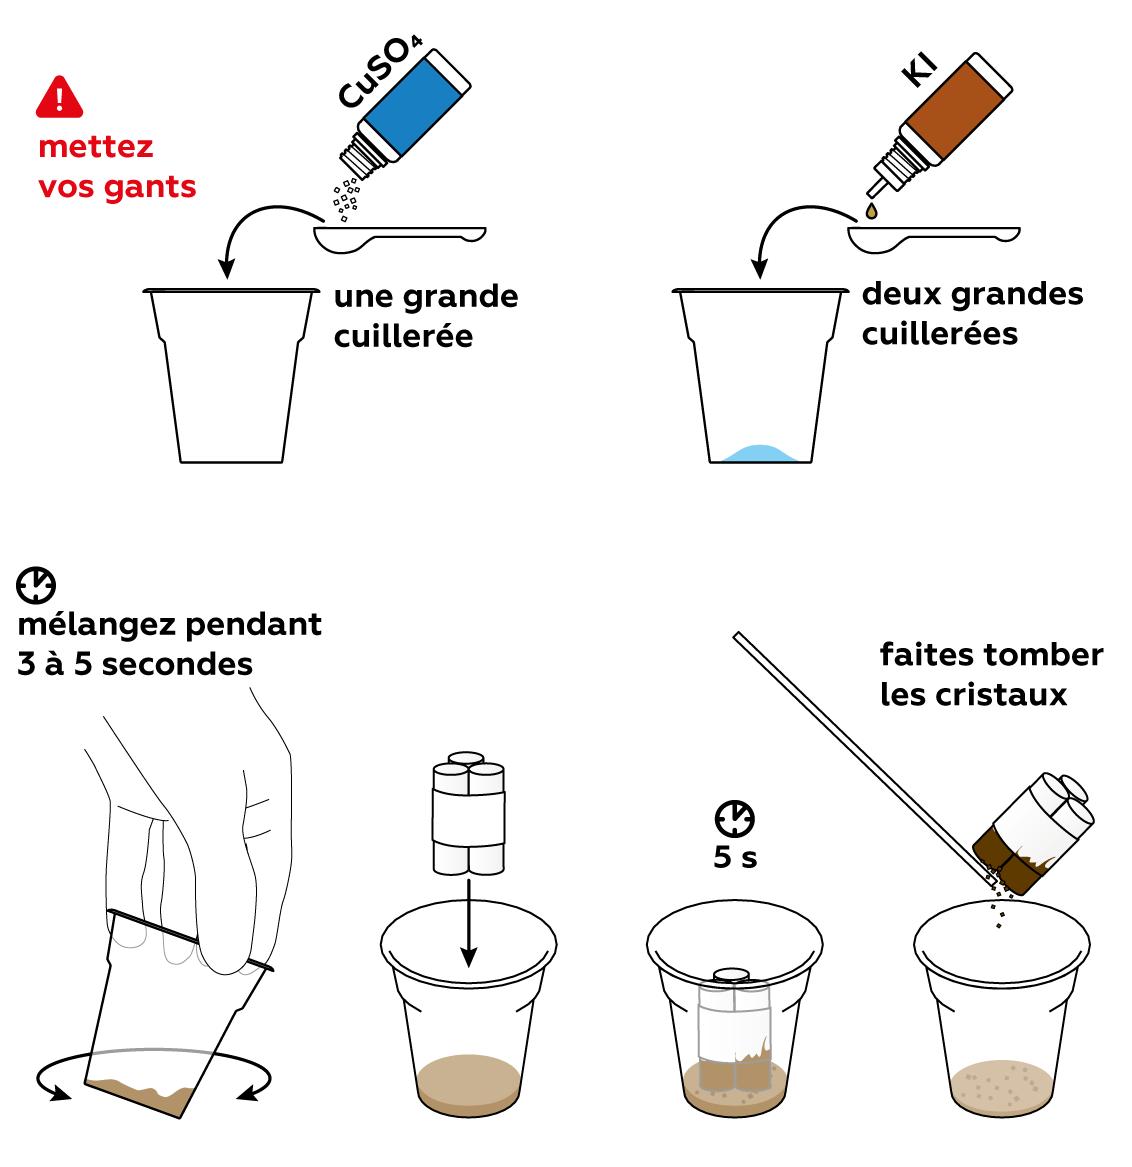 plants-v2_plants-vs-iodine_fr_iks-s-02